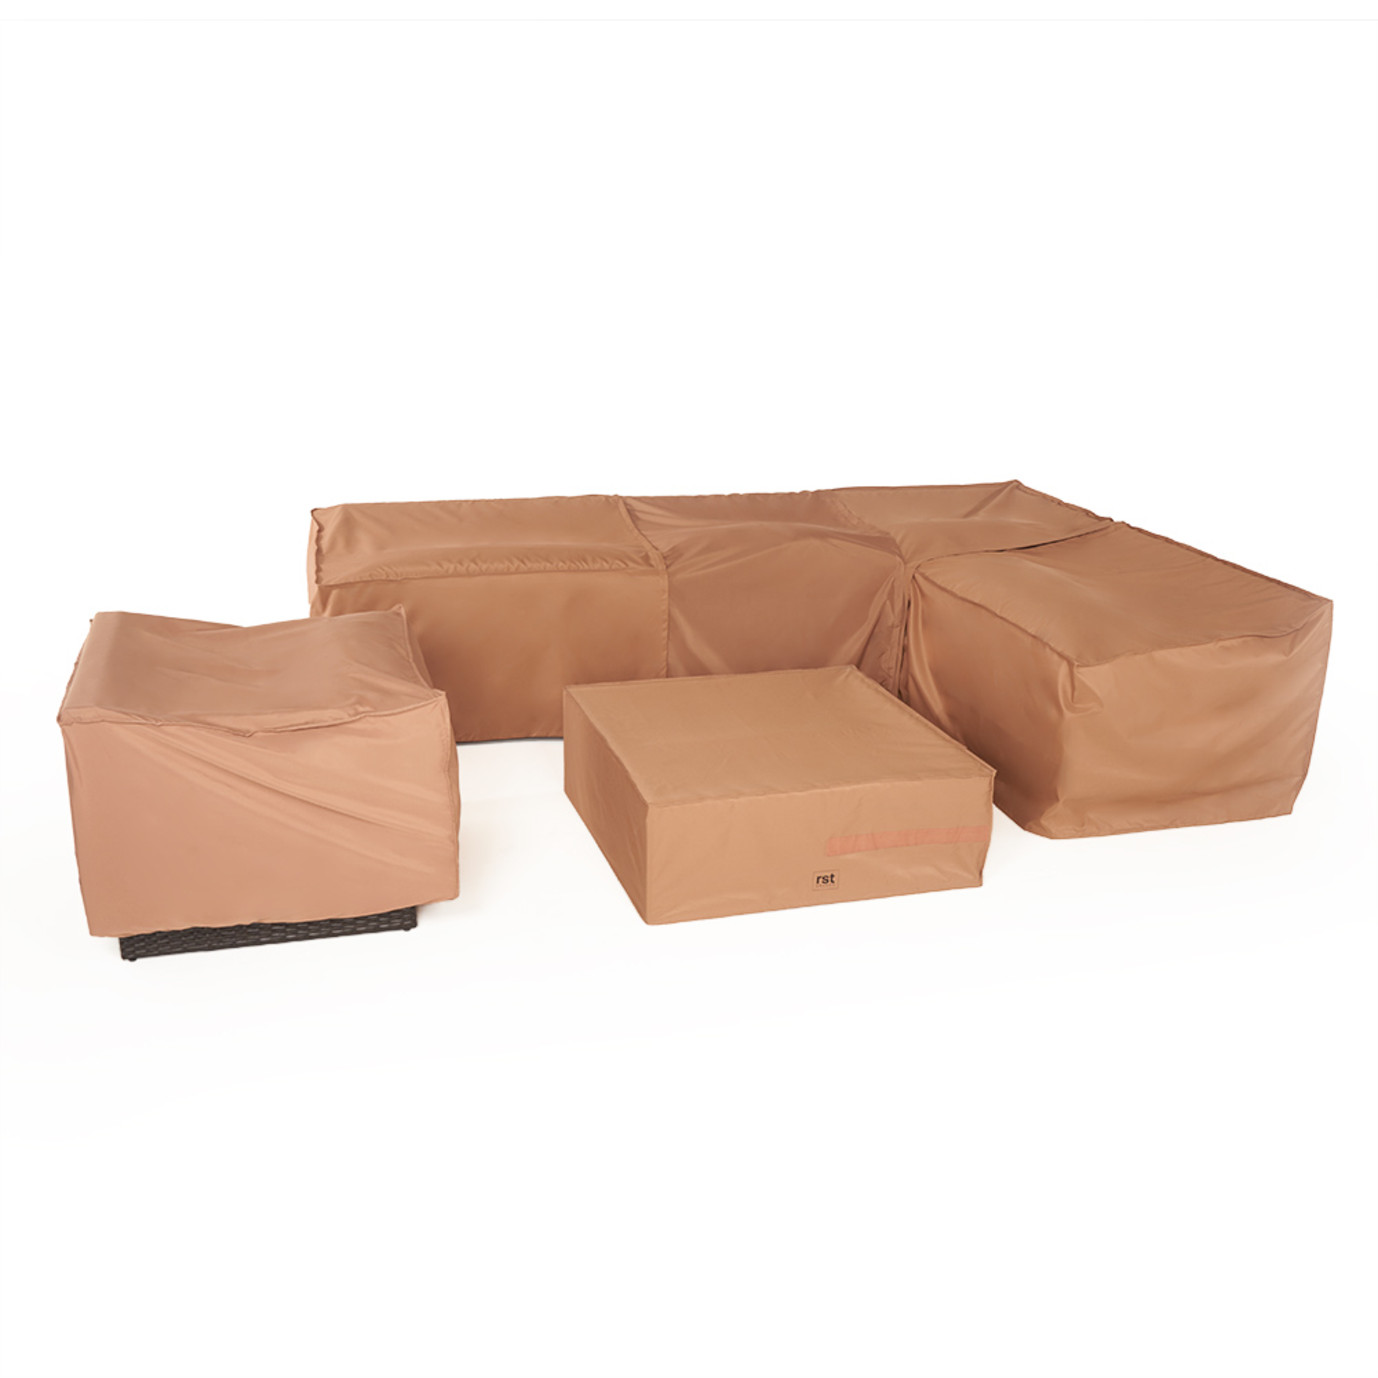 Portofino® Zipper Furniture Covers for 6pc Sofa Sectional 7x10